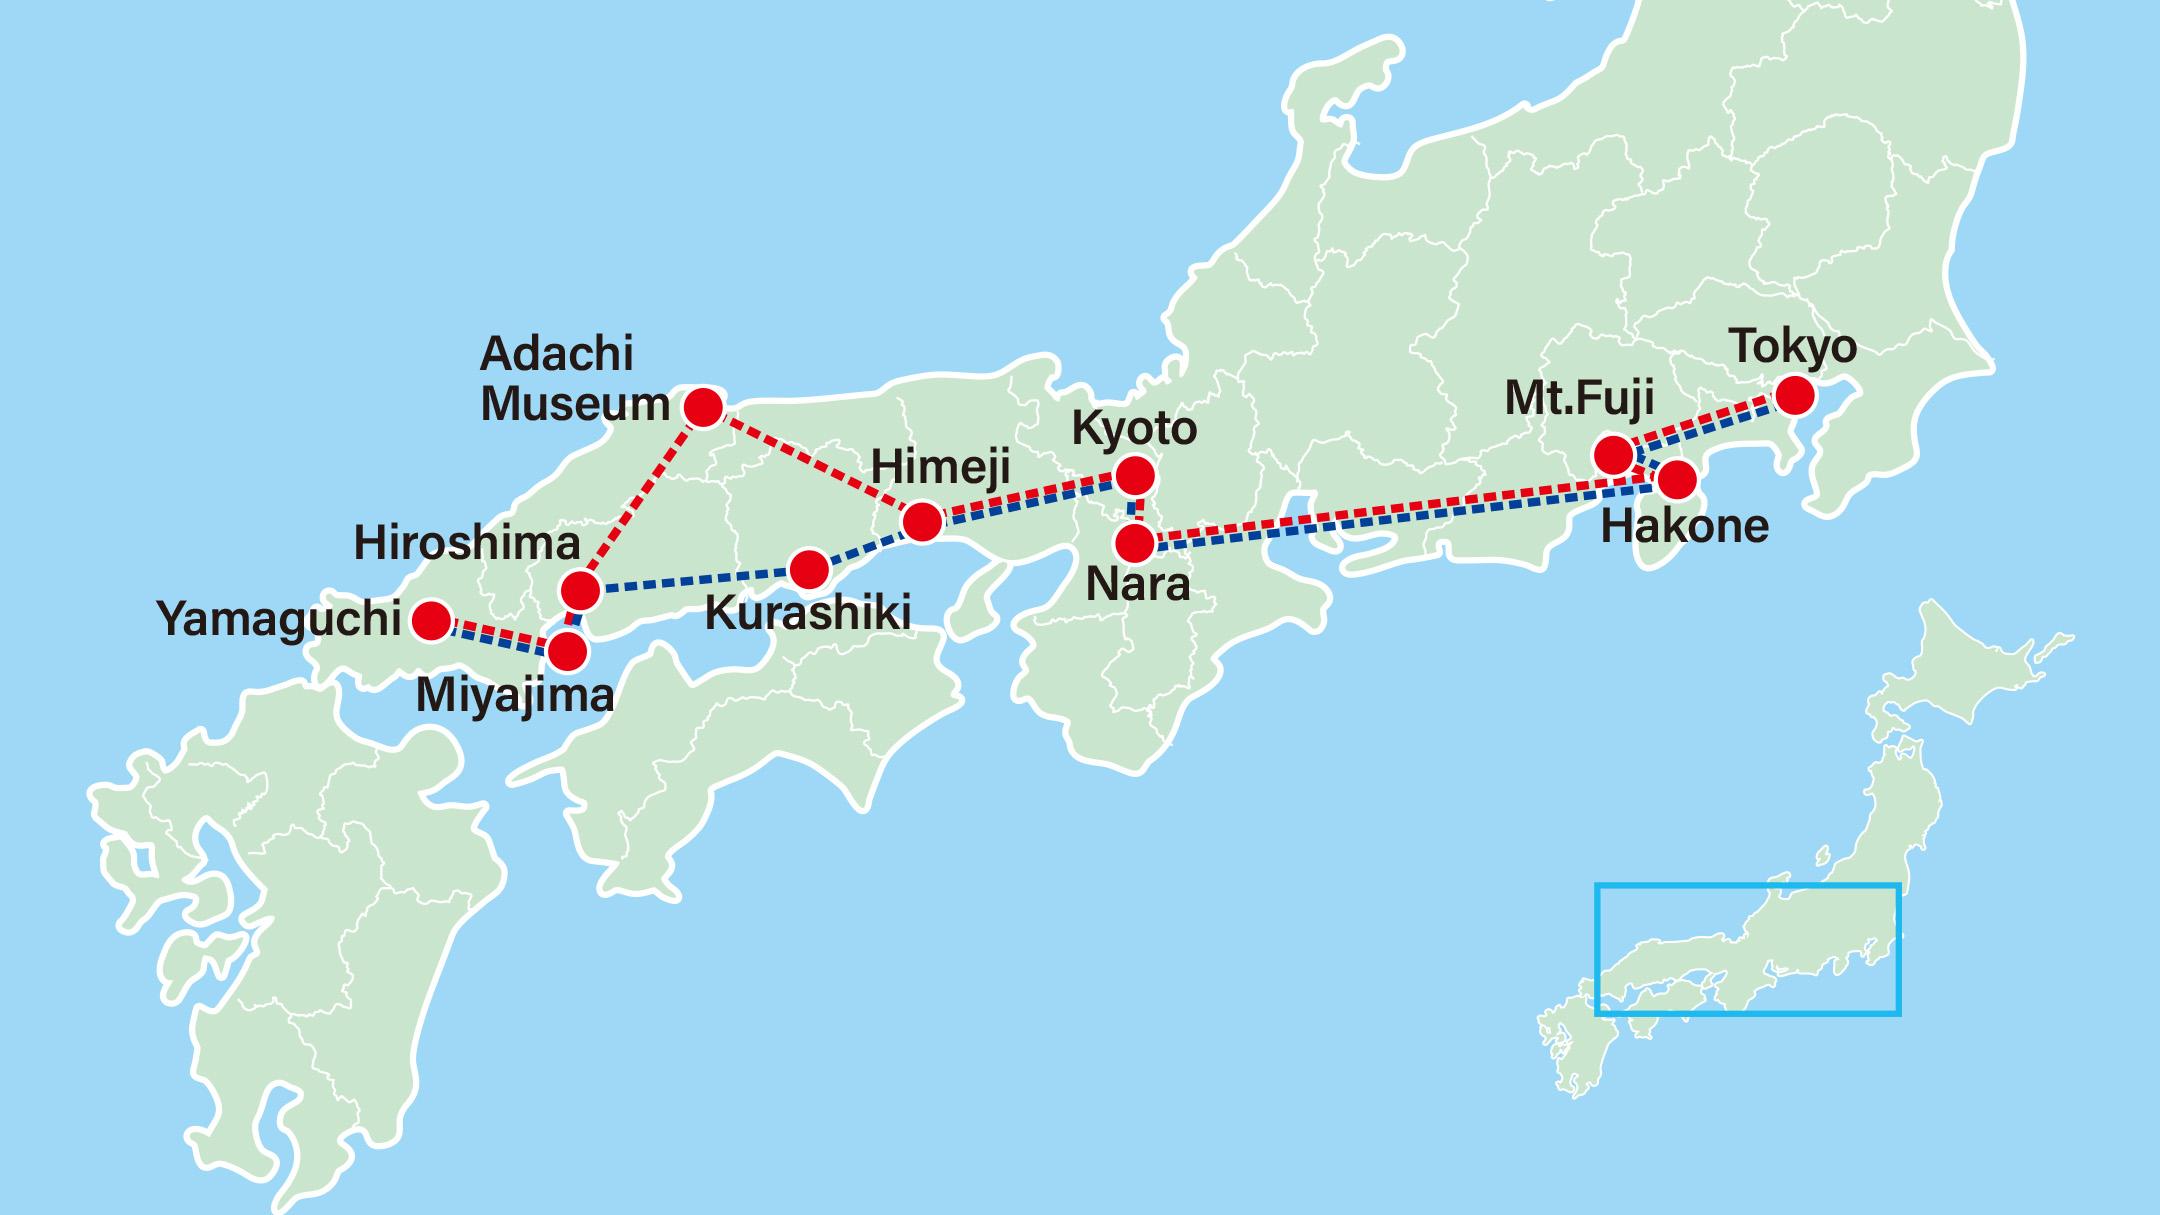 Japanese Ancestory Tour Yamaguchi Suo Oshima-Tokyo-Hakone-Kyoto-Nara-Himeji-Adachi-Hiroshima-Miyajima-Suo Island